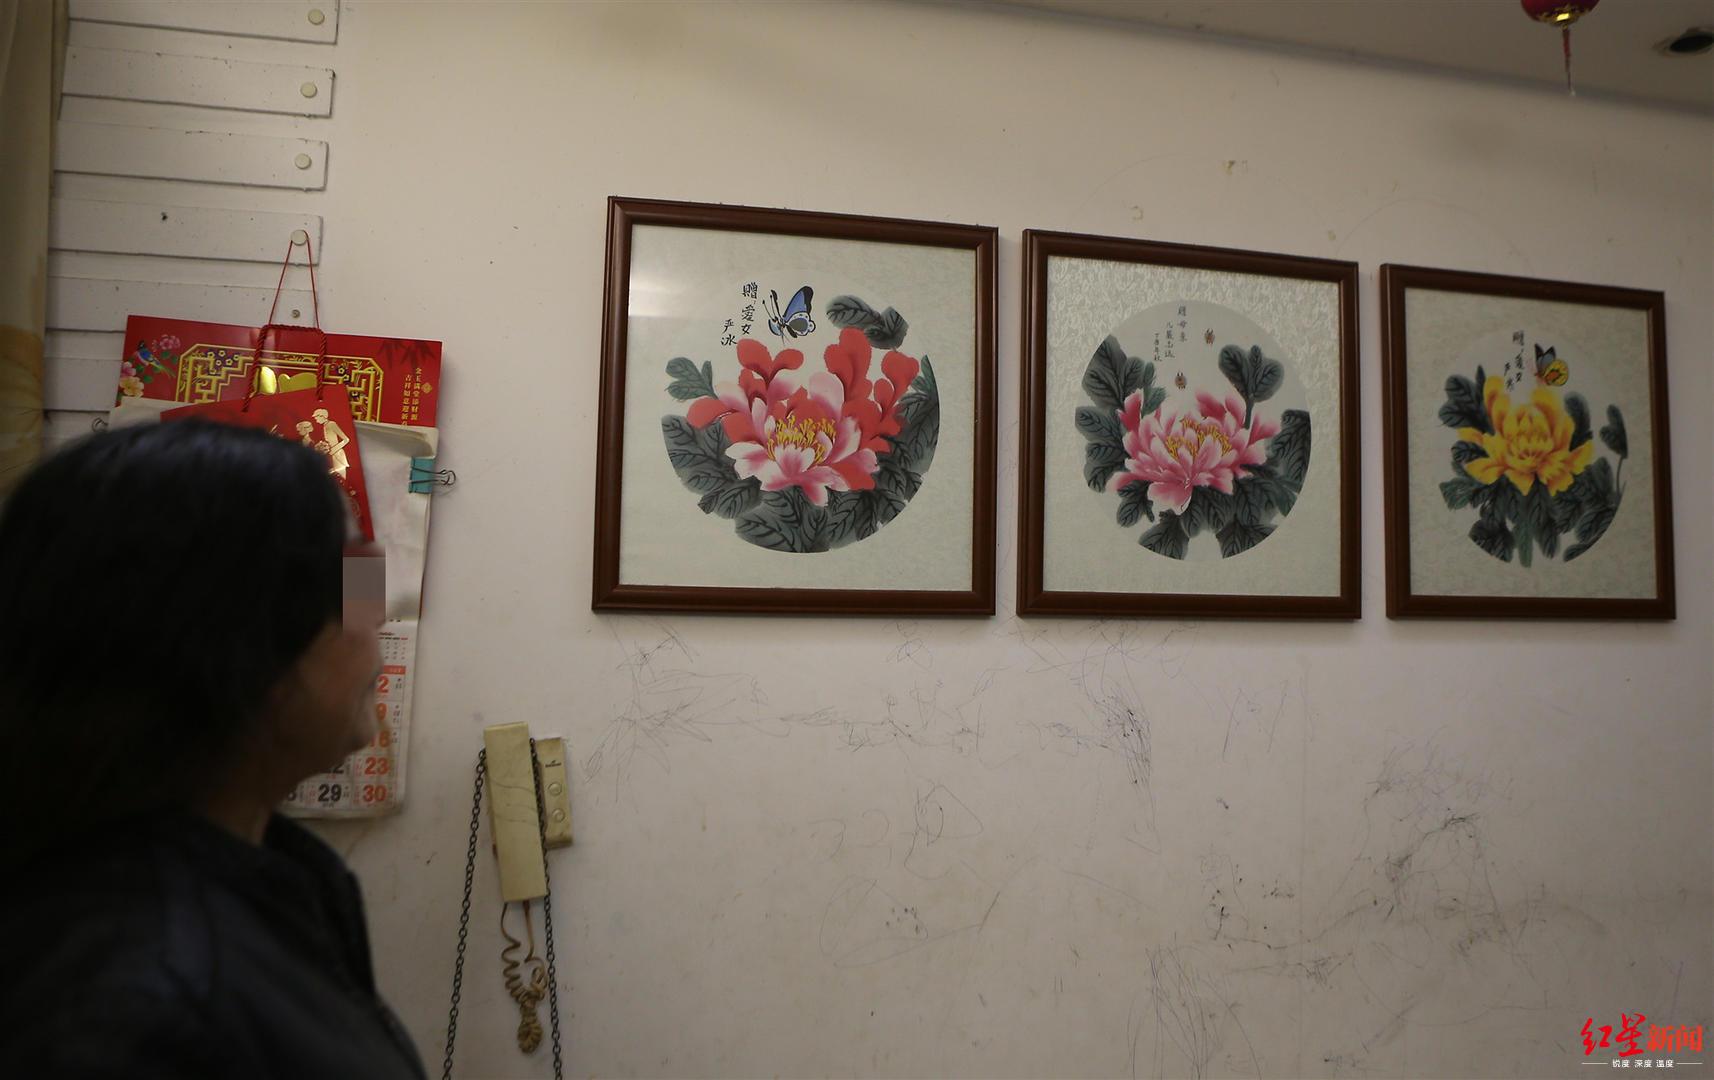 k7开户官网_香港楼市加速调整 9月份私楼楼价指数跌1.4%